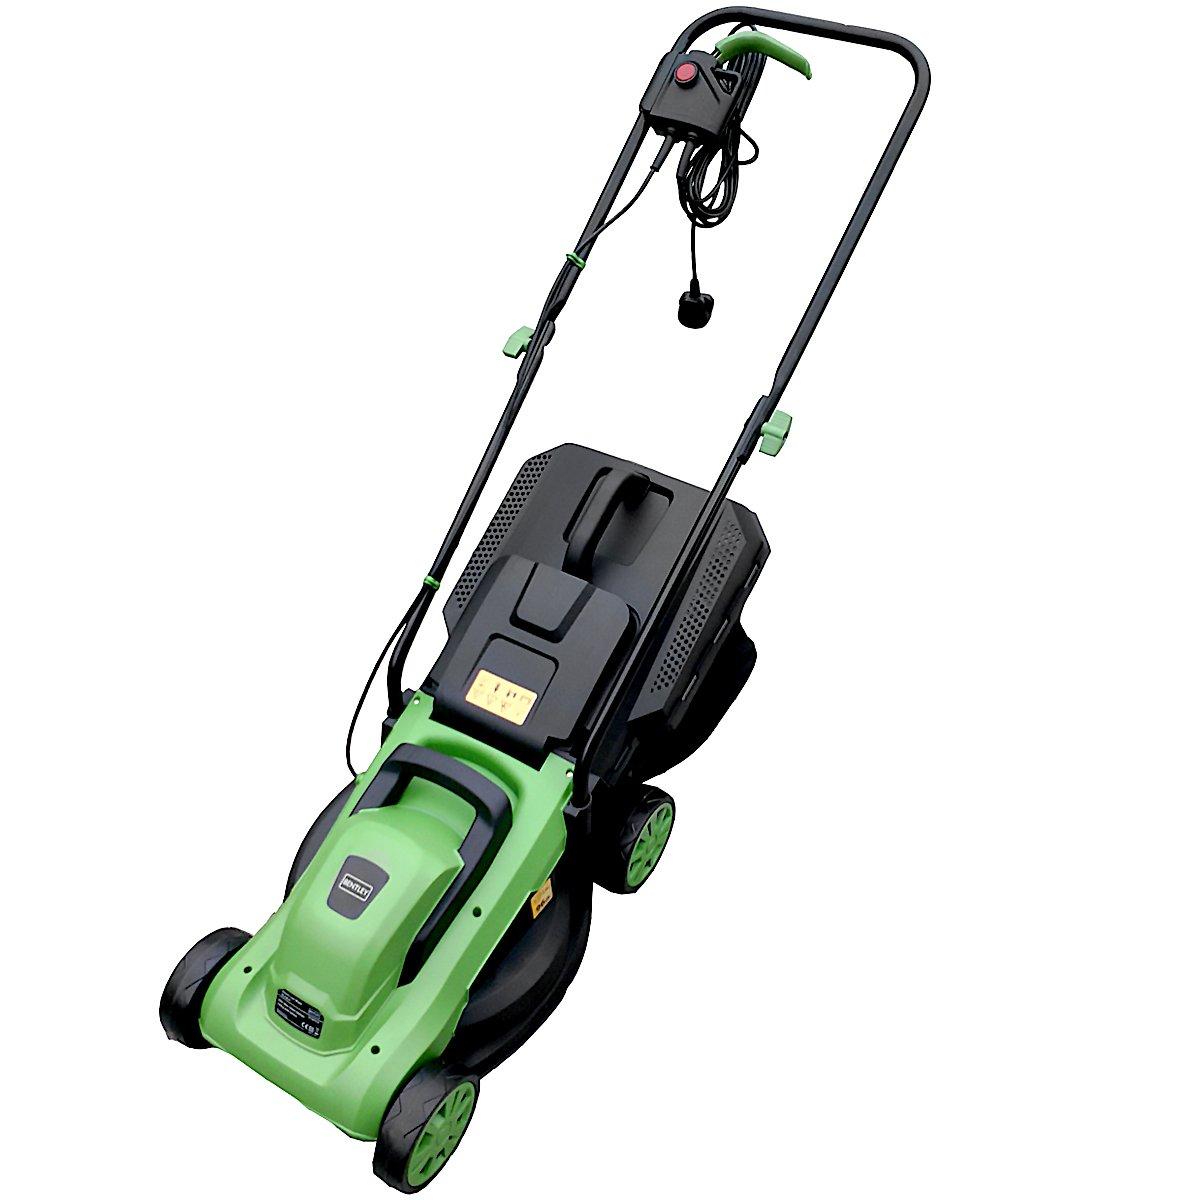 c//w STANLEY KeyTape from B/&Q from Homebase or Argos To Fit: Rotak 370 ER Electric Lawnmower Bosch Rotak Genuine Cutting Blade /& Rotak 37-14 Ergo Electric Lawnmower